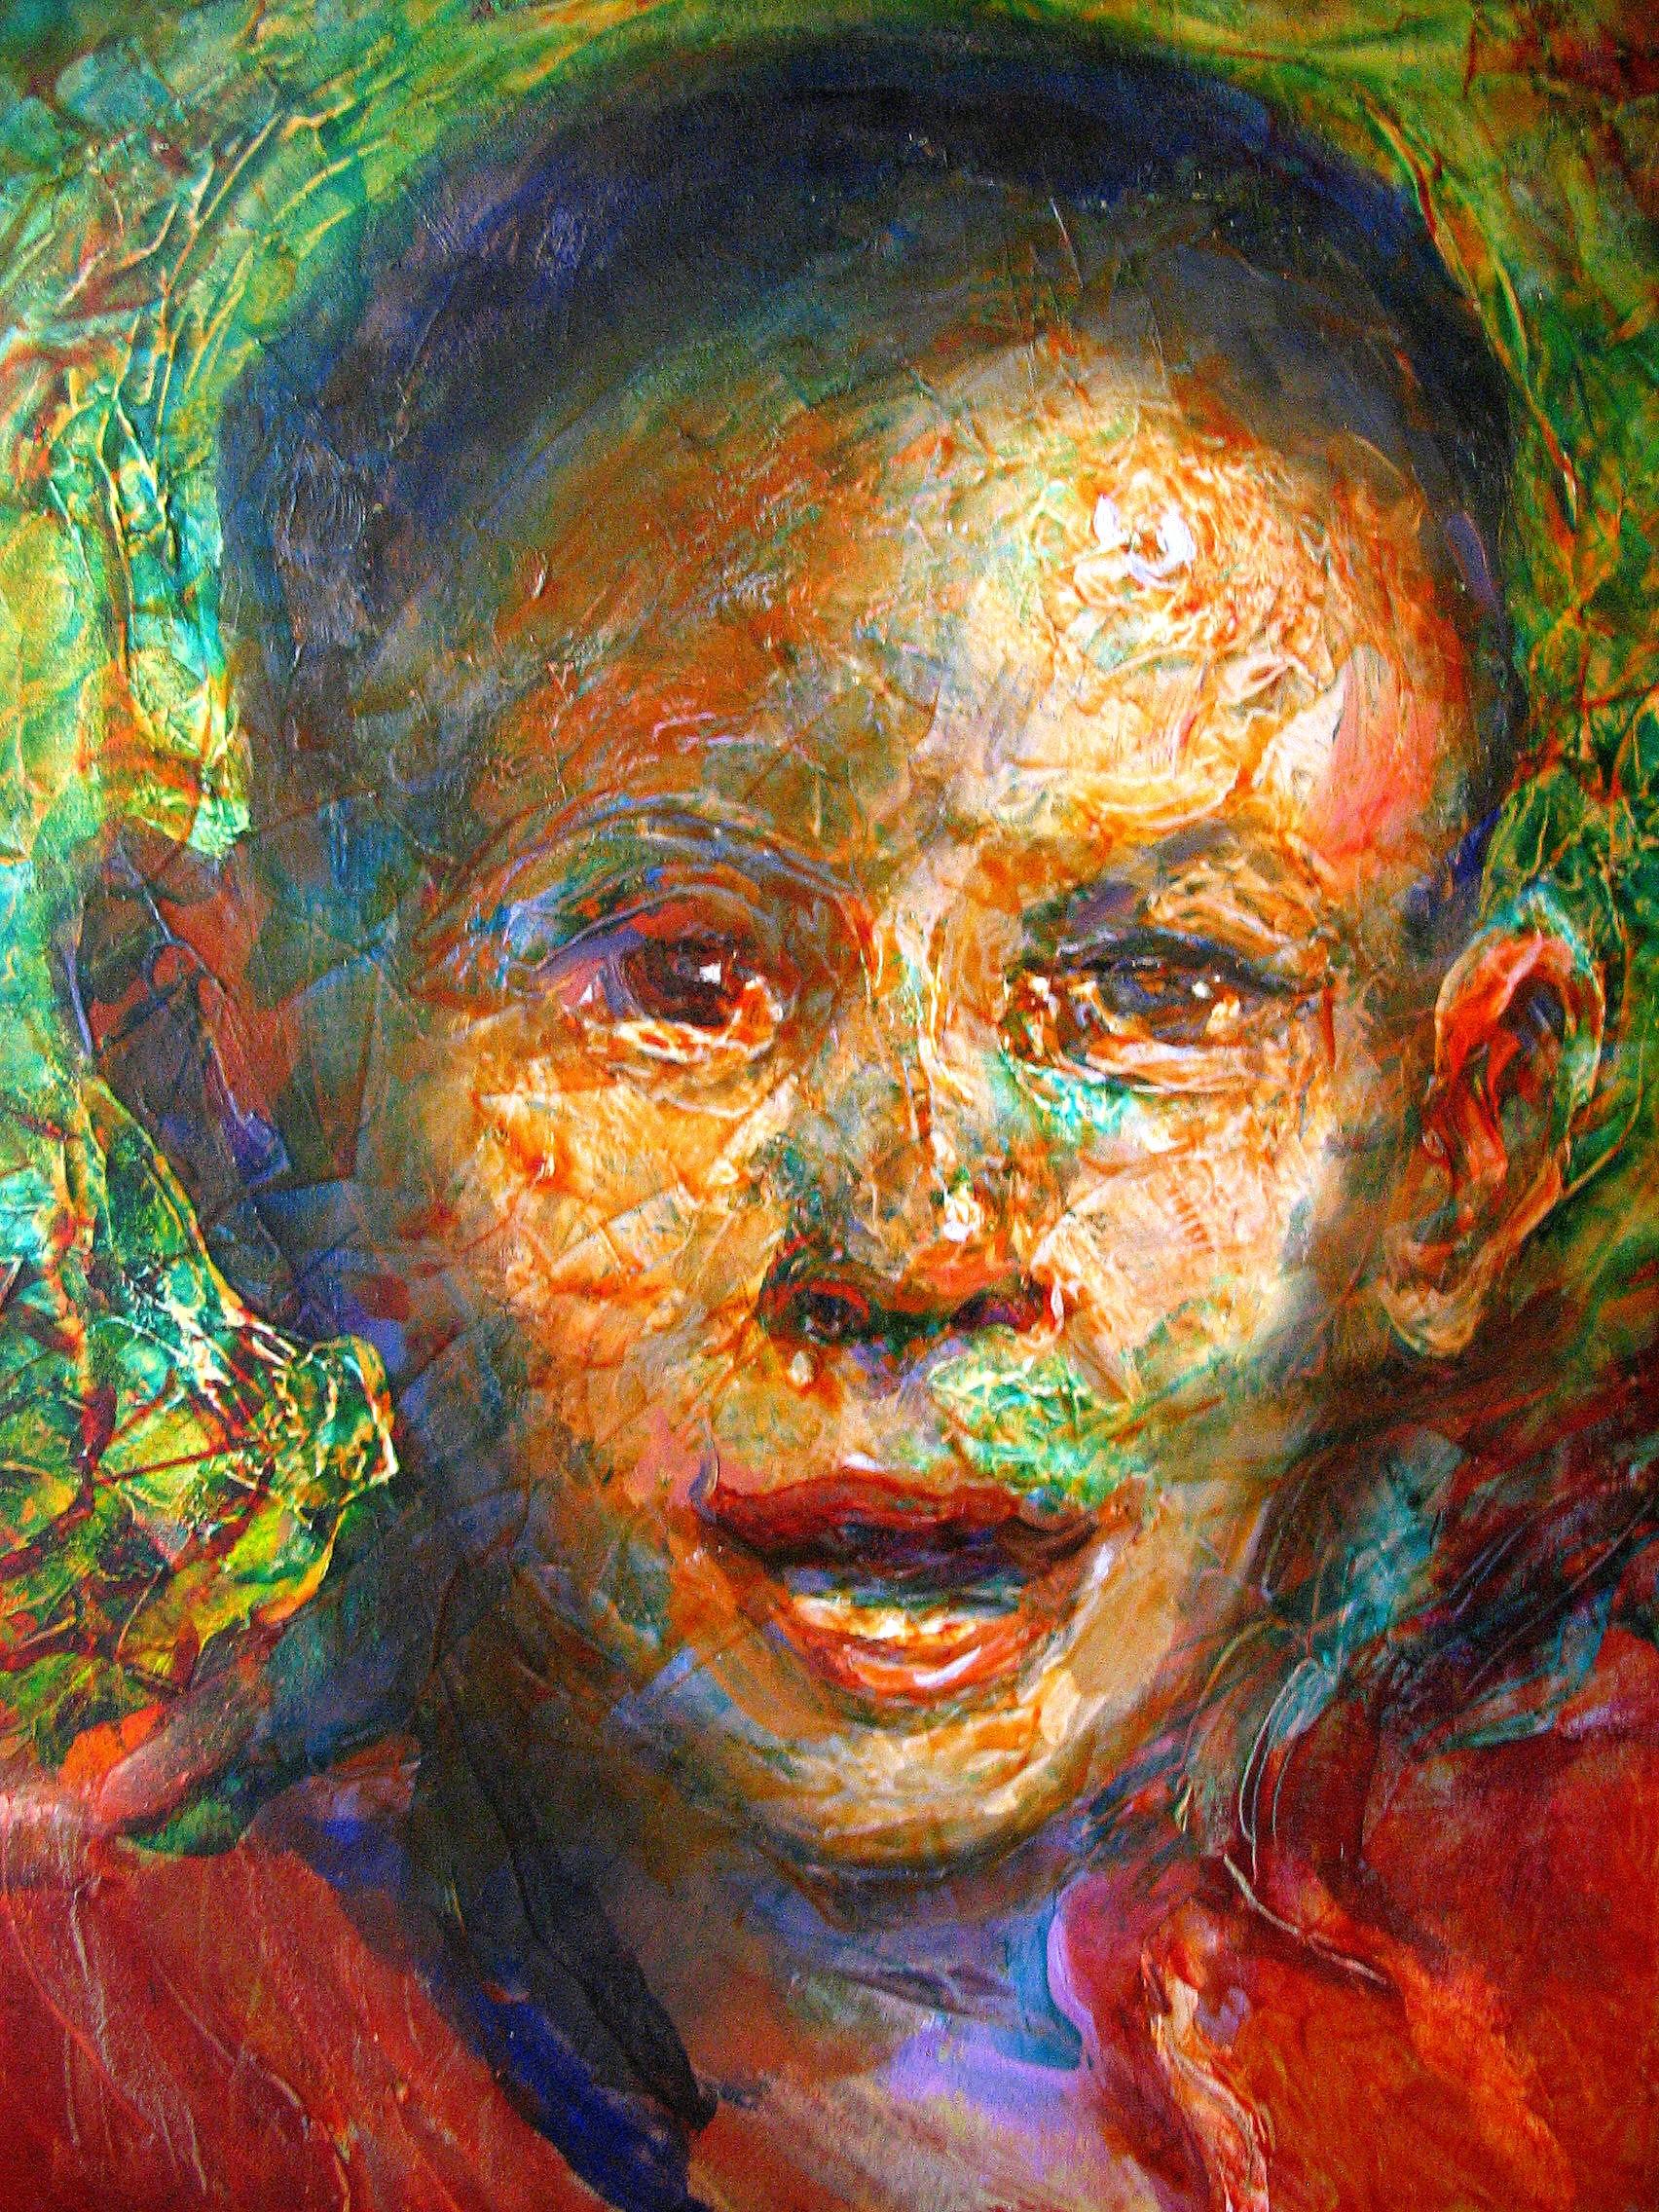 Art Exhibit Features Portraits of Missing Children by Artist John Paul Thornton